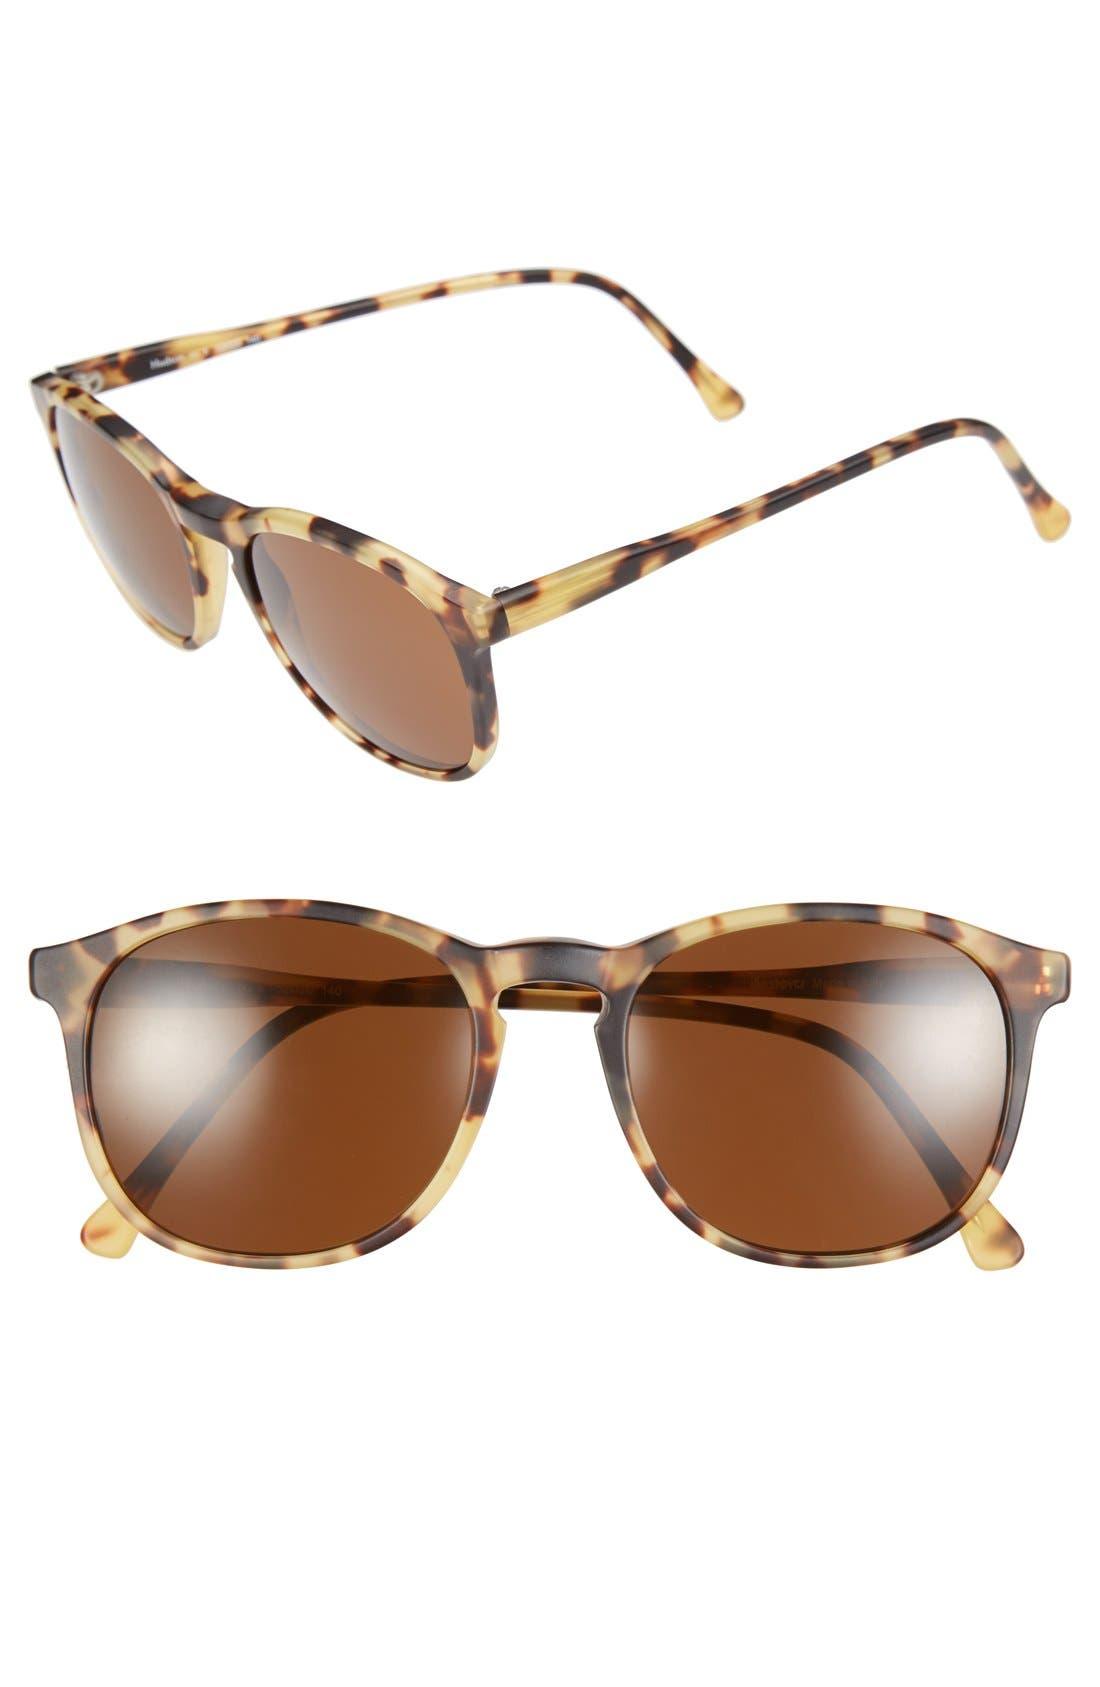 Main Image - Illesteva 'Hudson' 52mm Keyhole Sunglasses